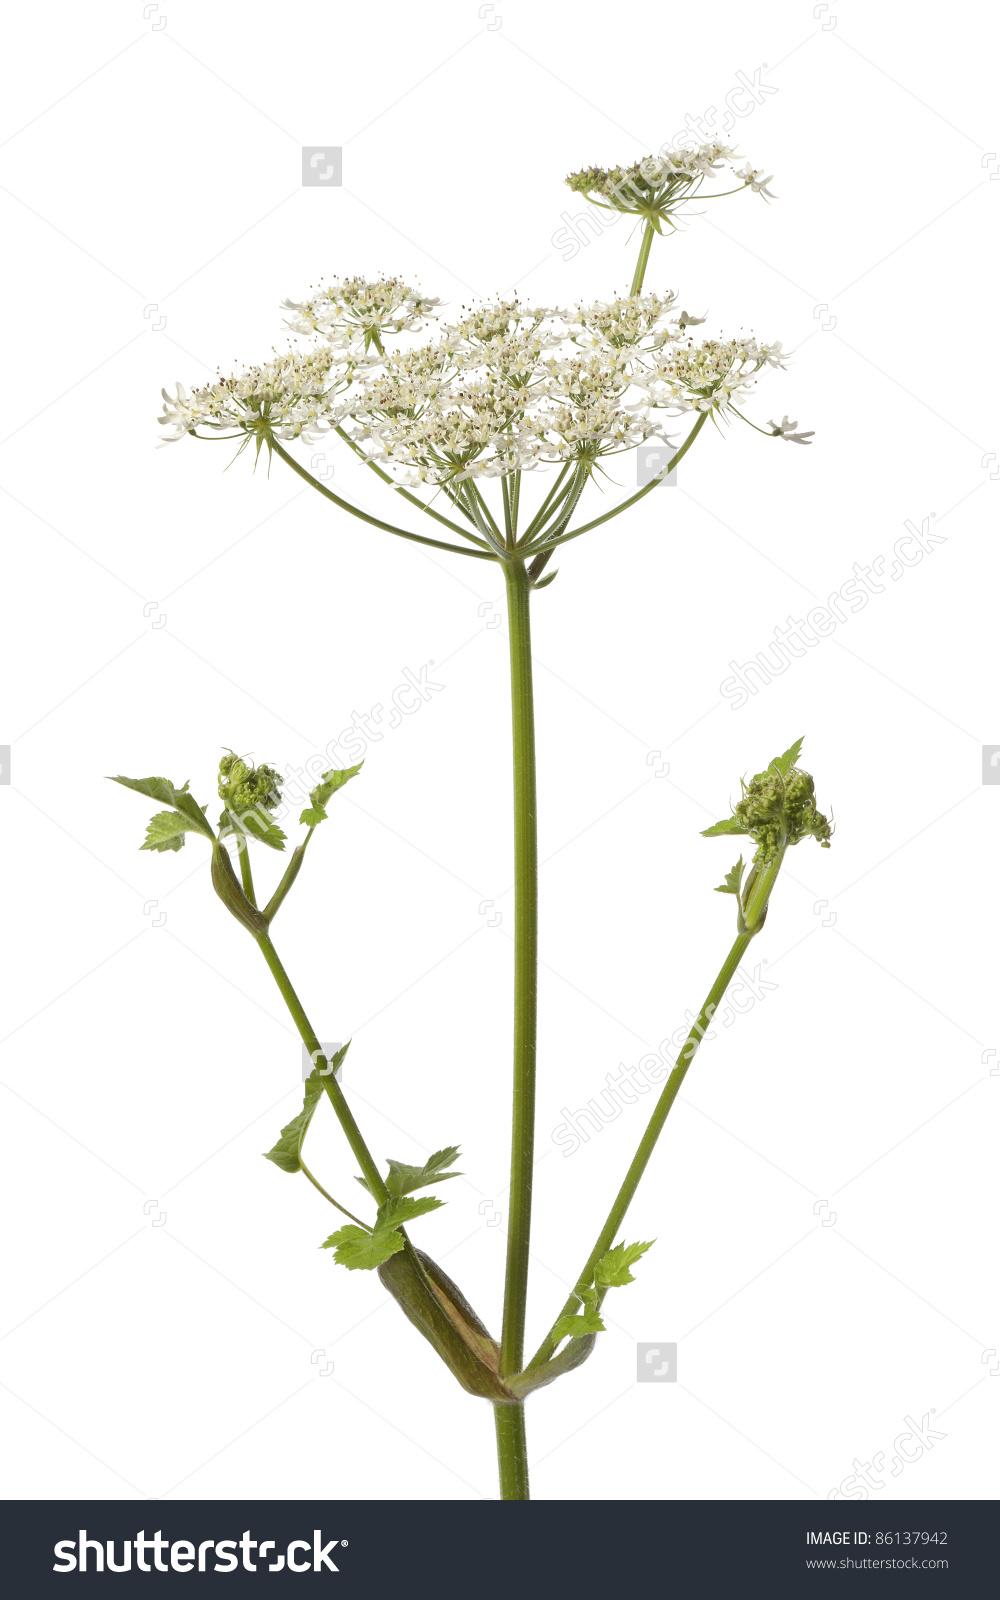 Wild Angelica Flower On White Background Stock Photo 86137942.